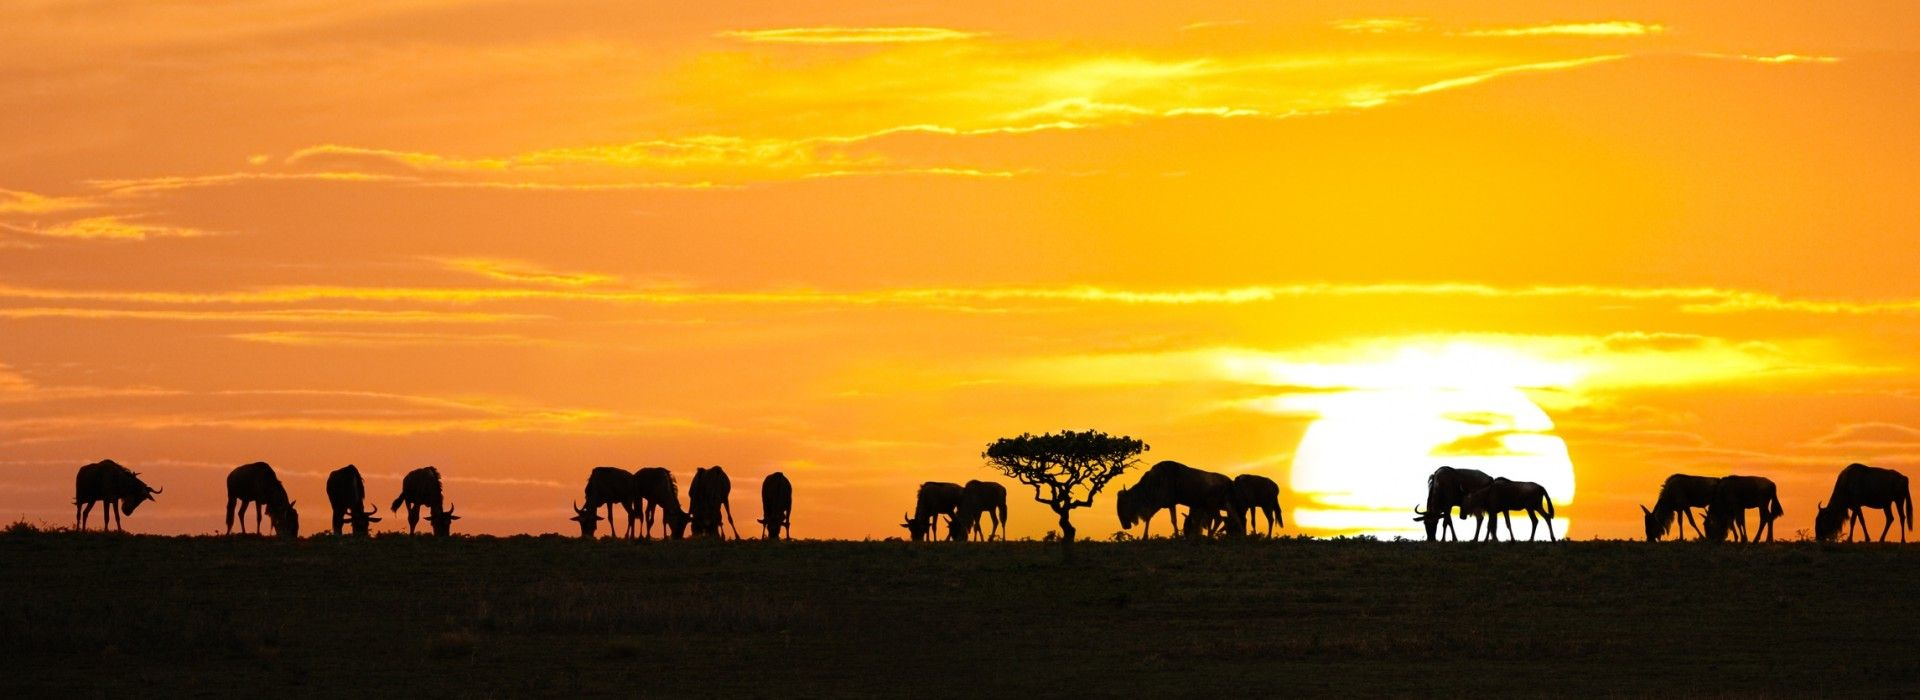 Explorer Tours in Ngorongoro Conservation Area